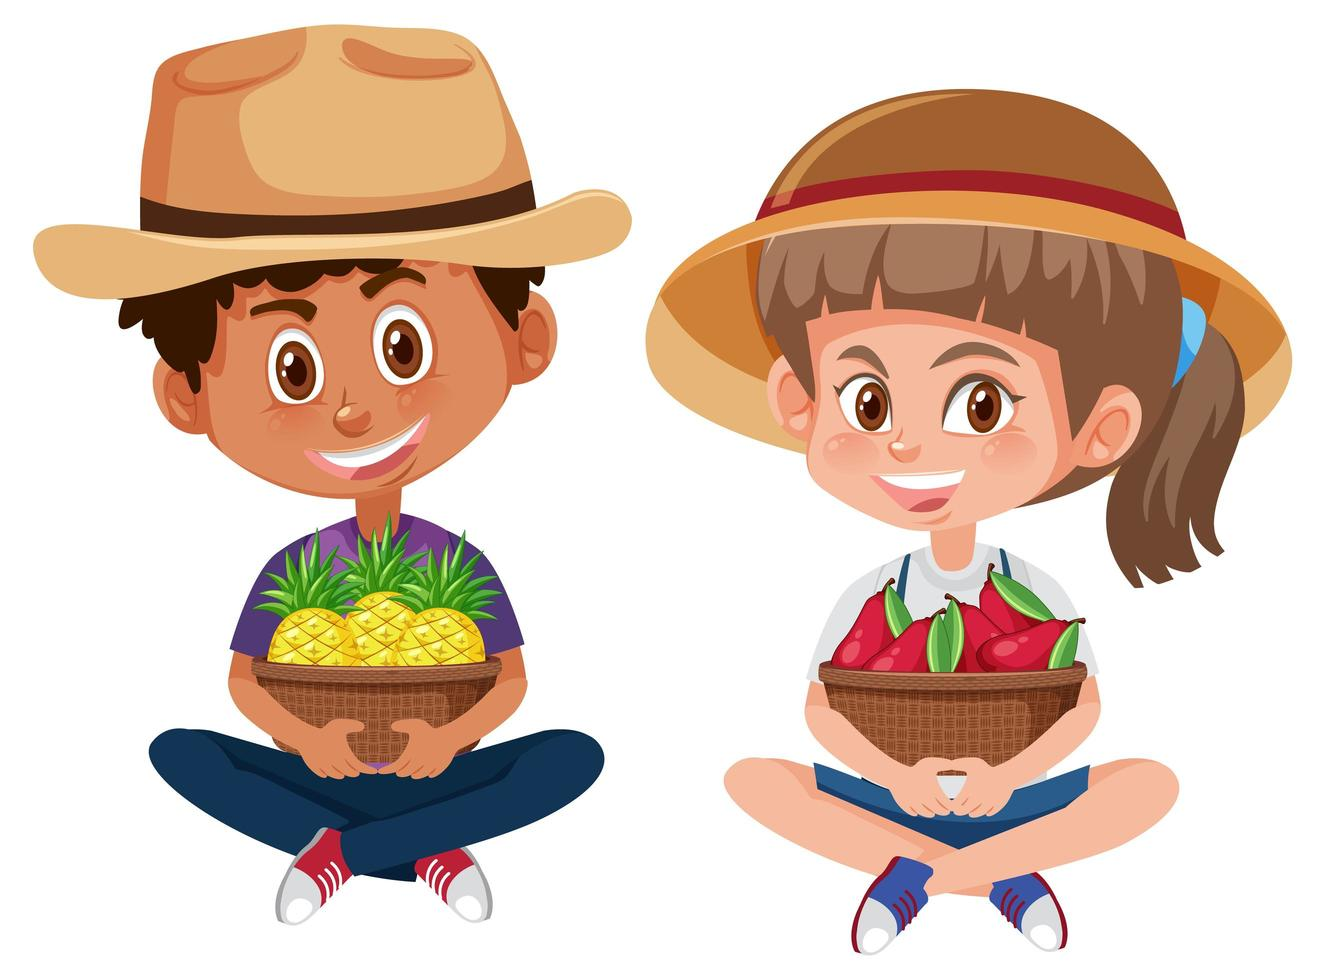 Kinder halten Obst in Körben vektor